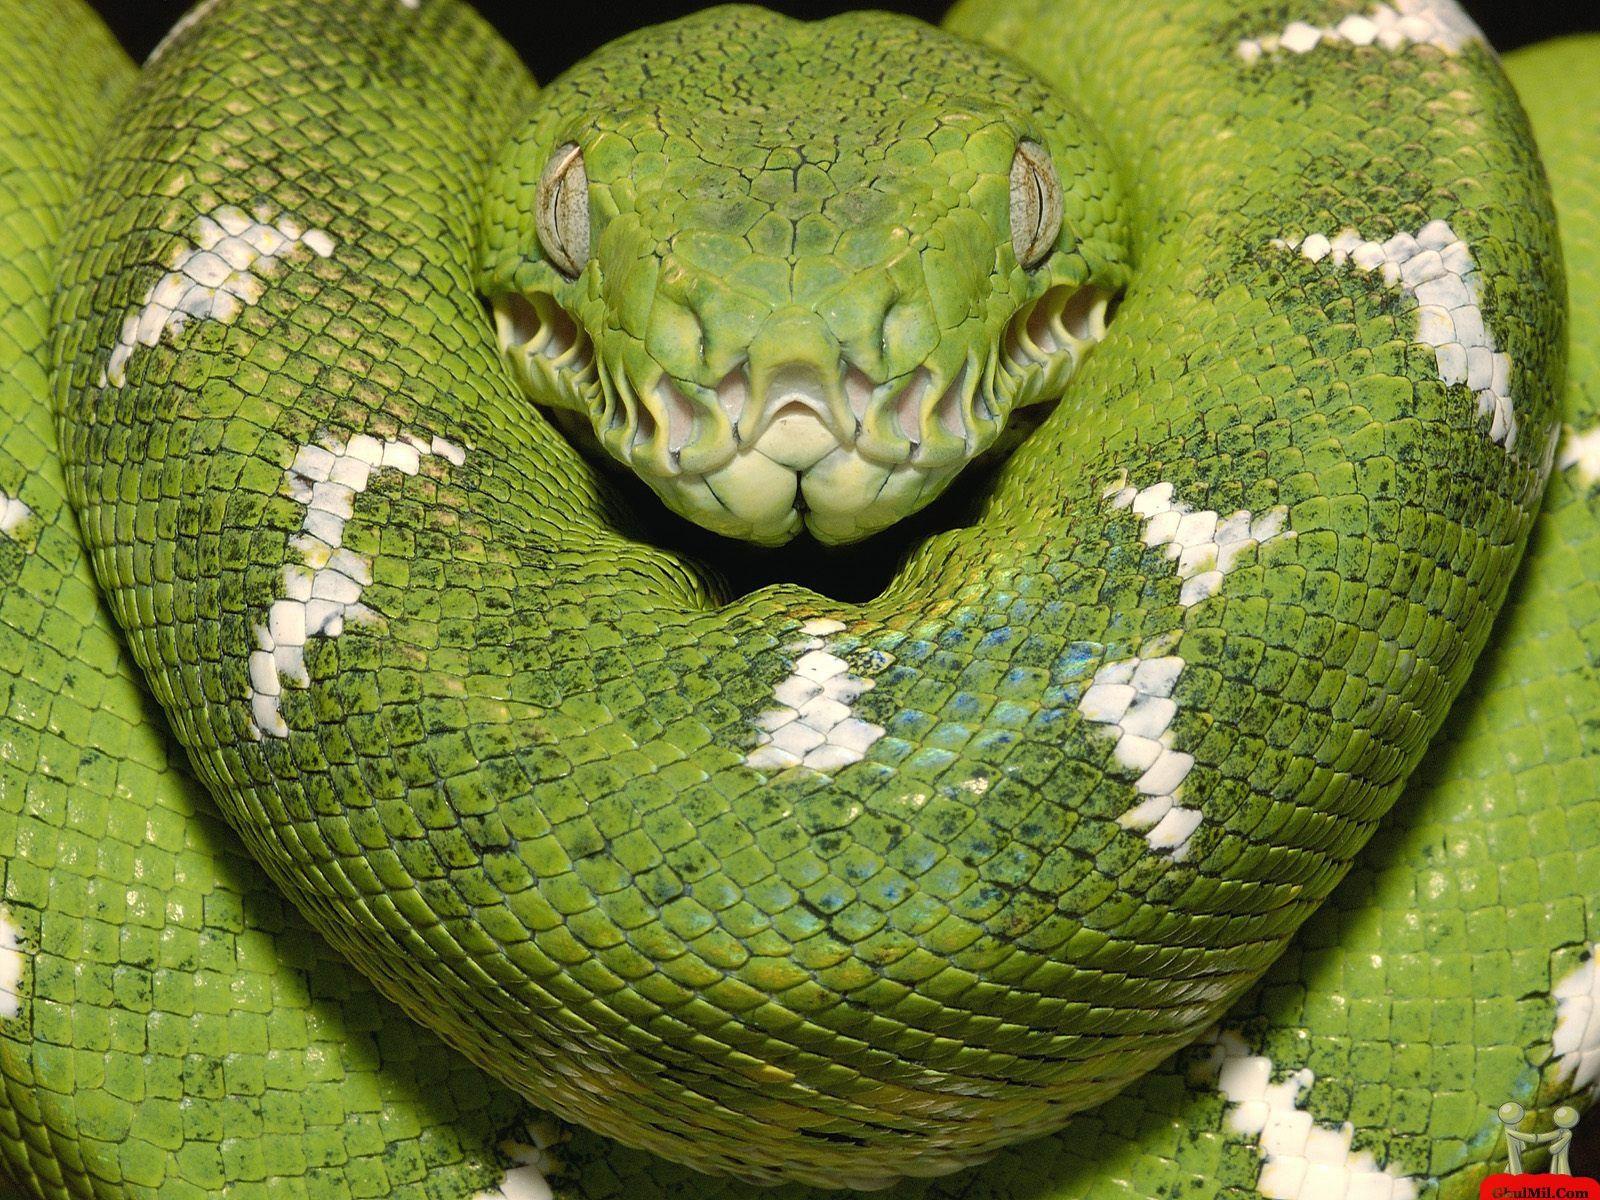 5. The Green Anaconda – 25 Ft. Long, 500 Pounds